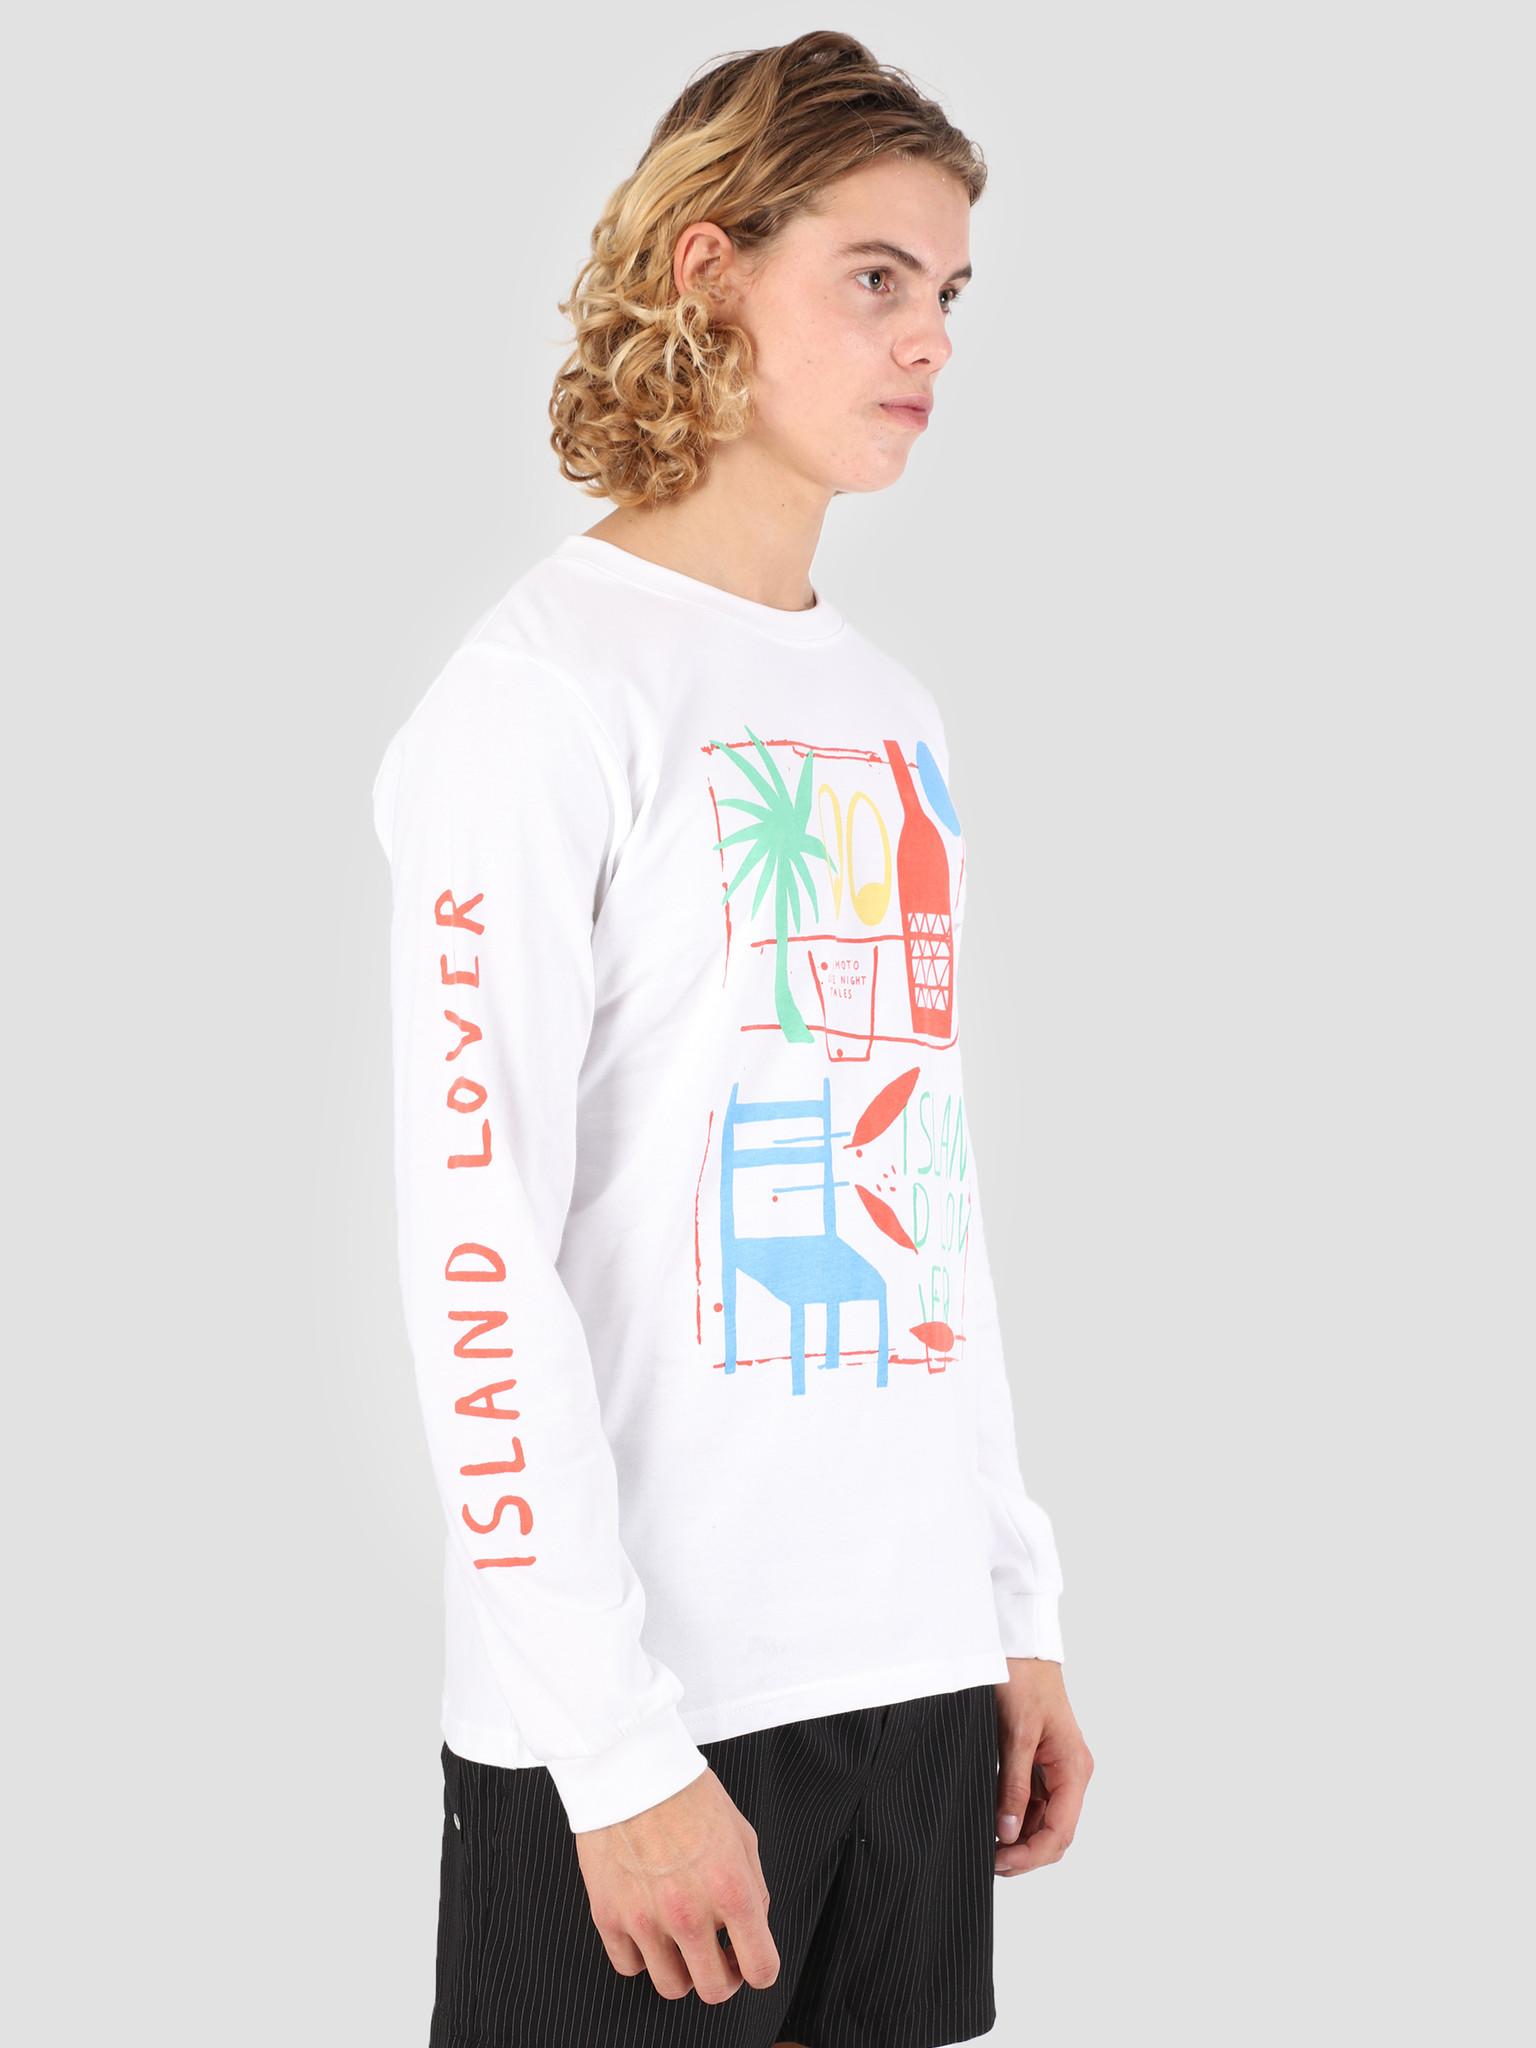 Wemoto Wemoto Lover Longsleeve T-Shirt White 131.103-200